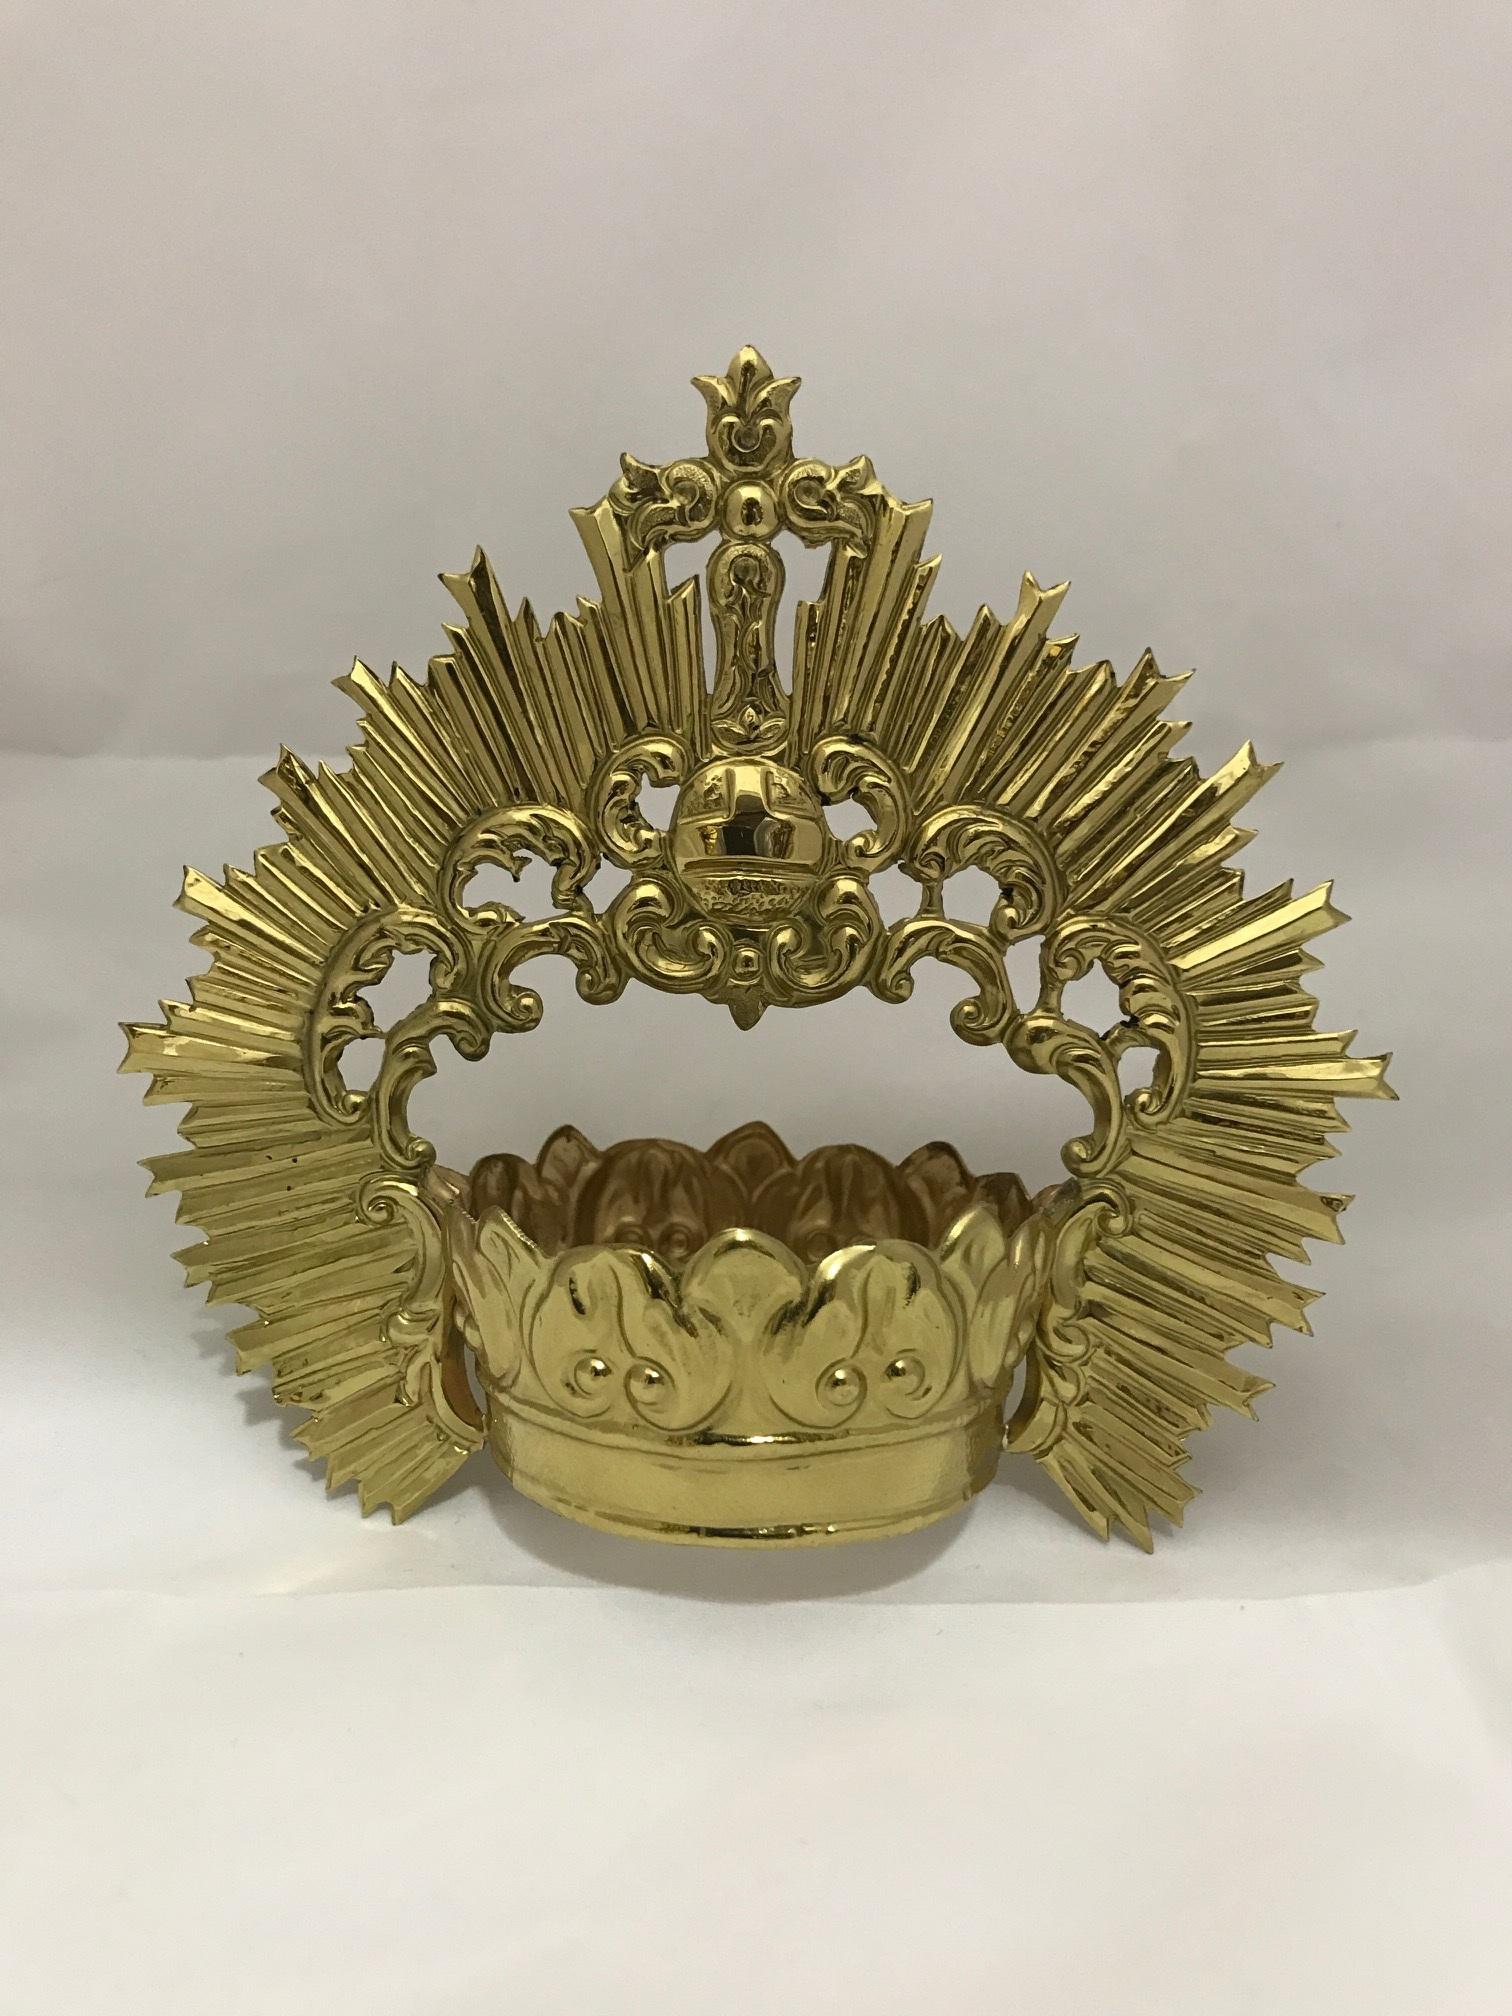 Corona dorada cincelada